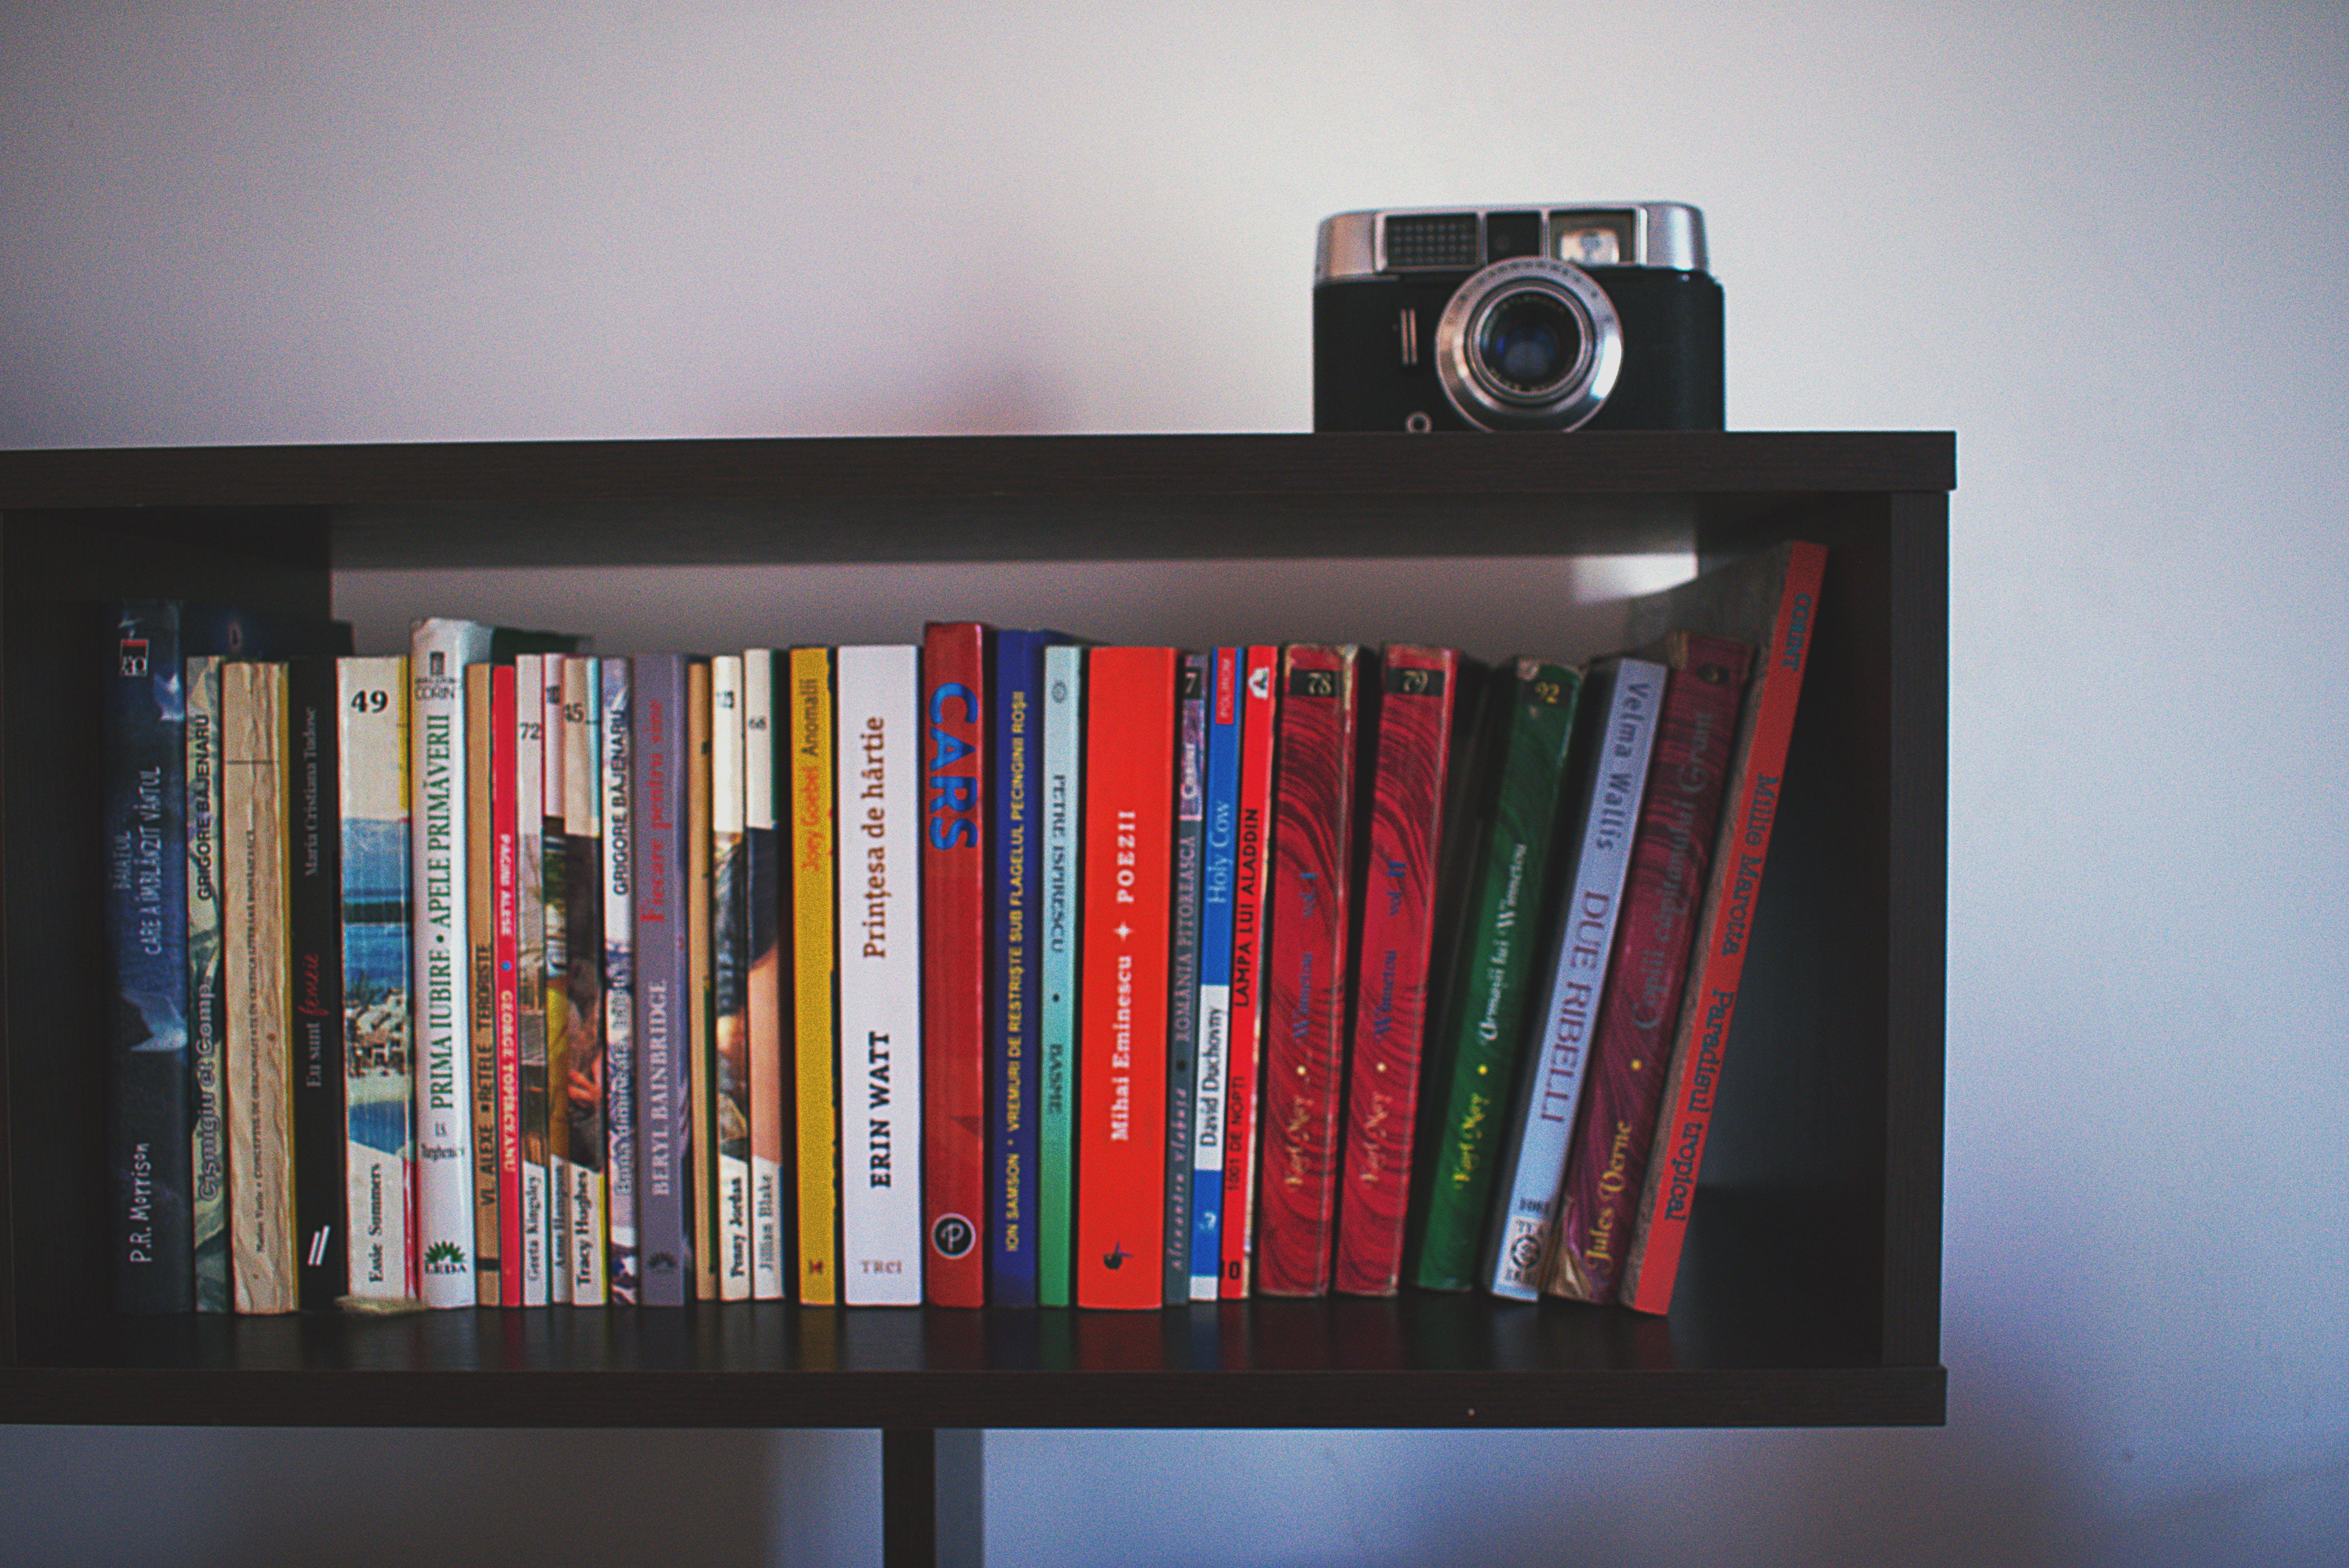 Black Wooden Shelf and Black Camera